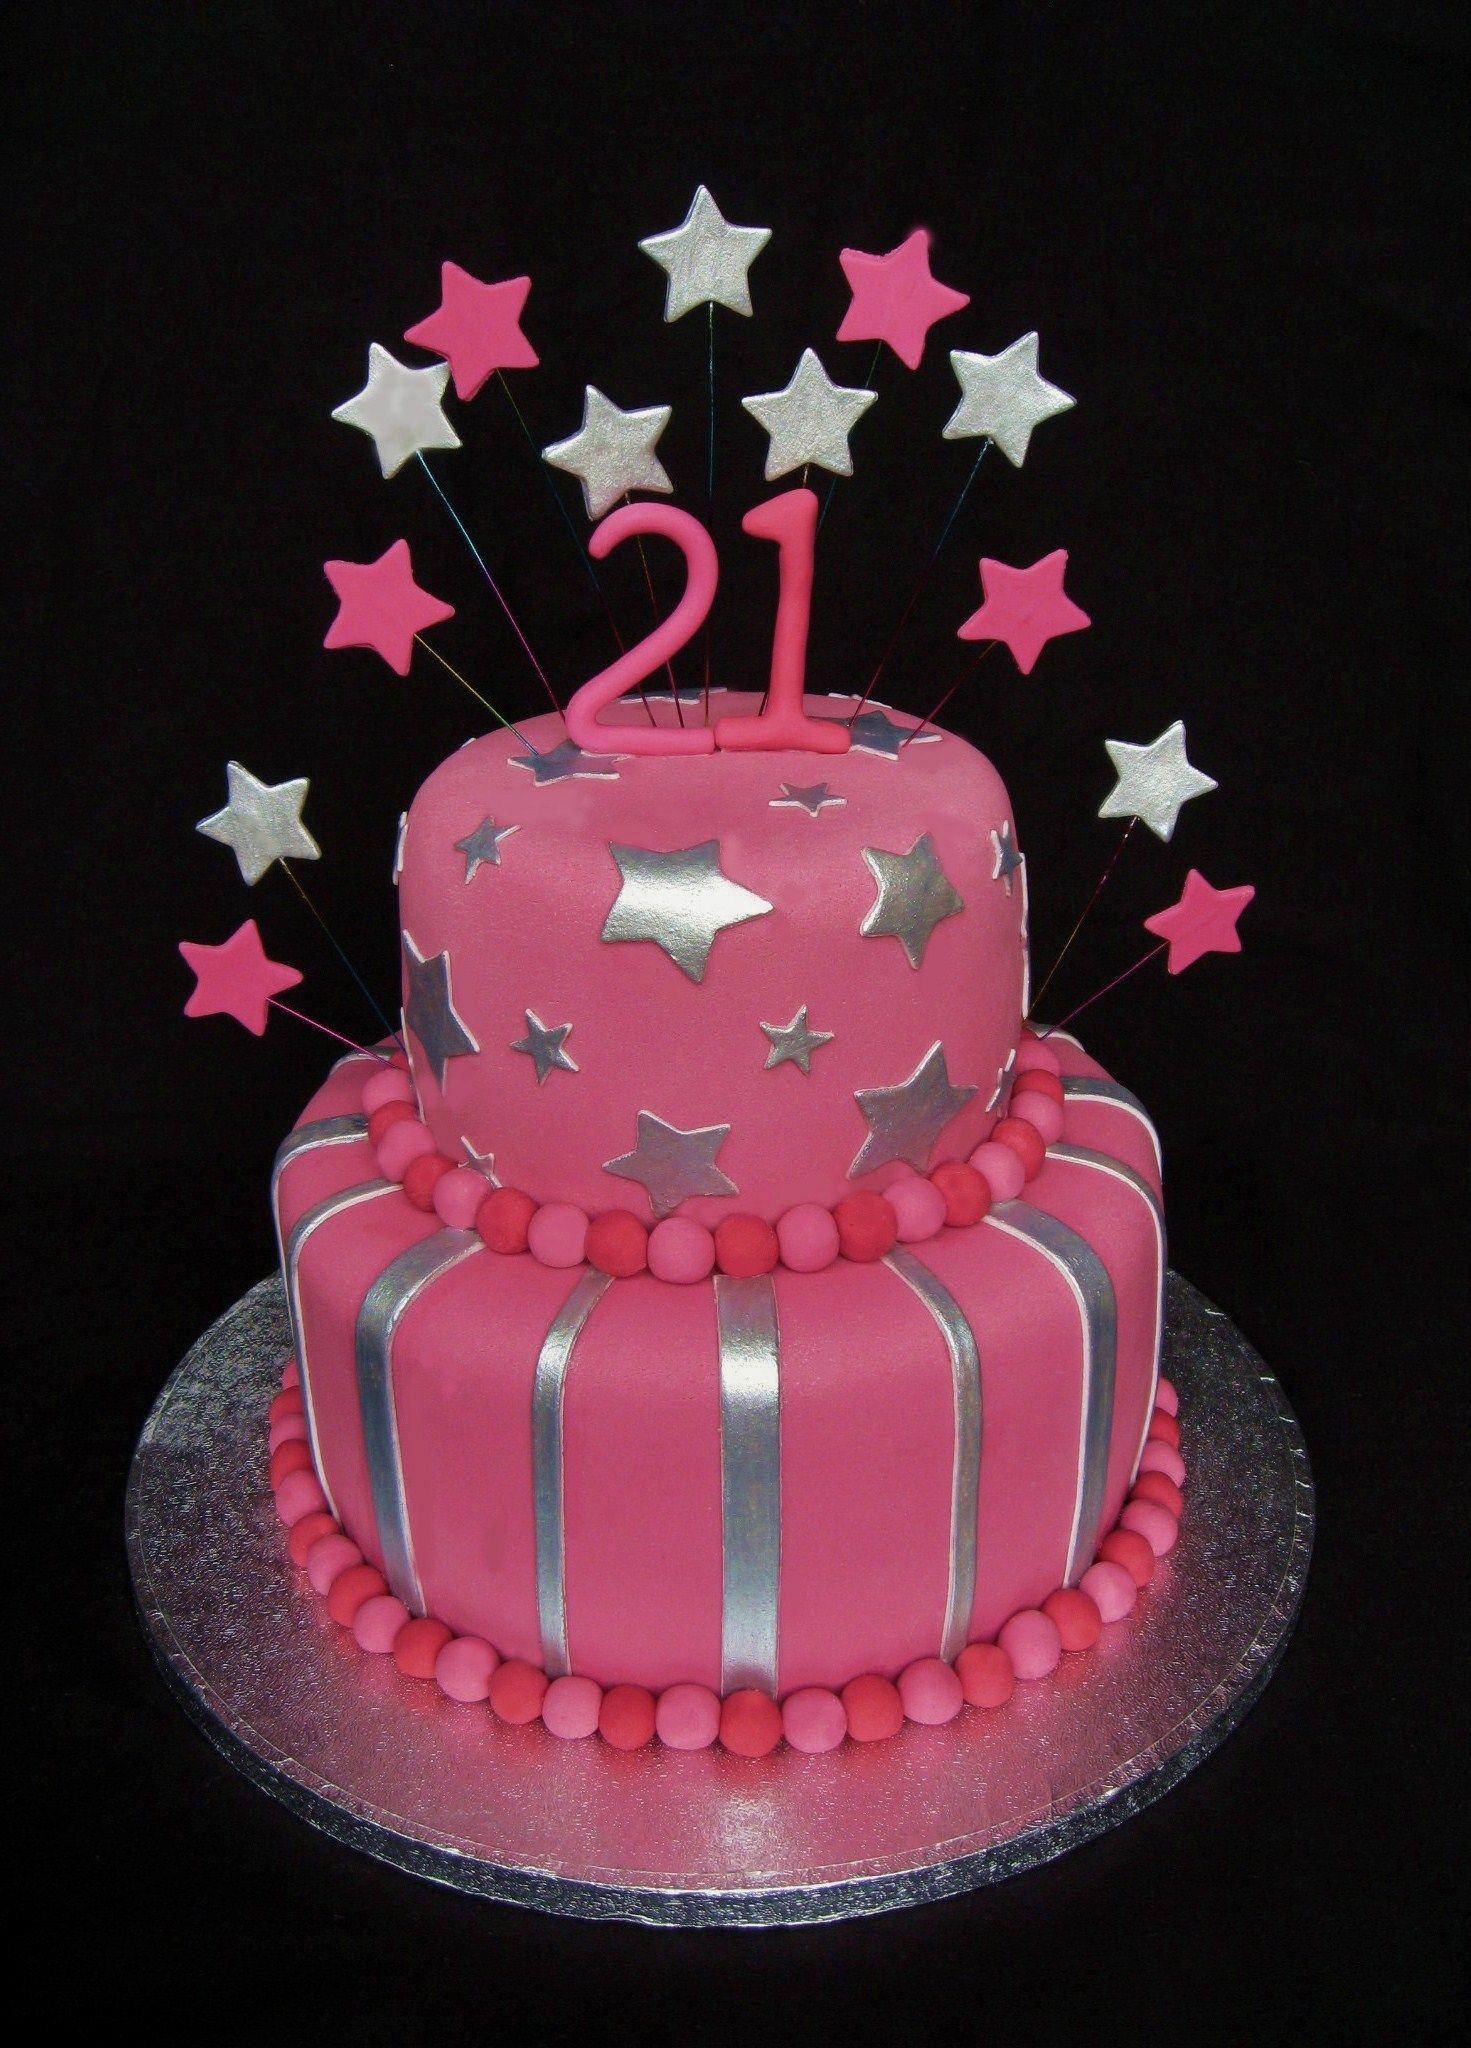 23 Marvelous Image Of 21 Birthday Cake Ideas